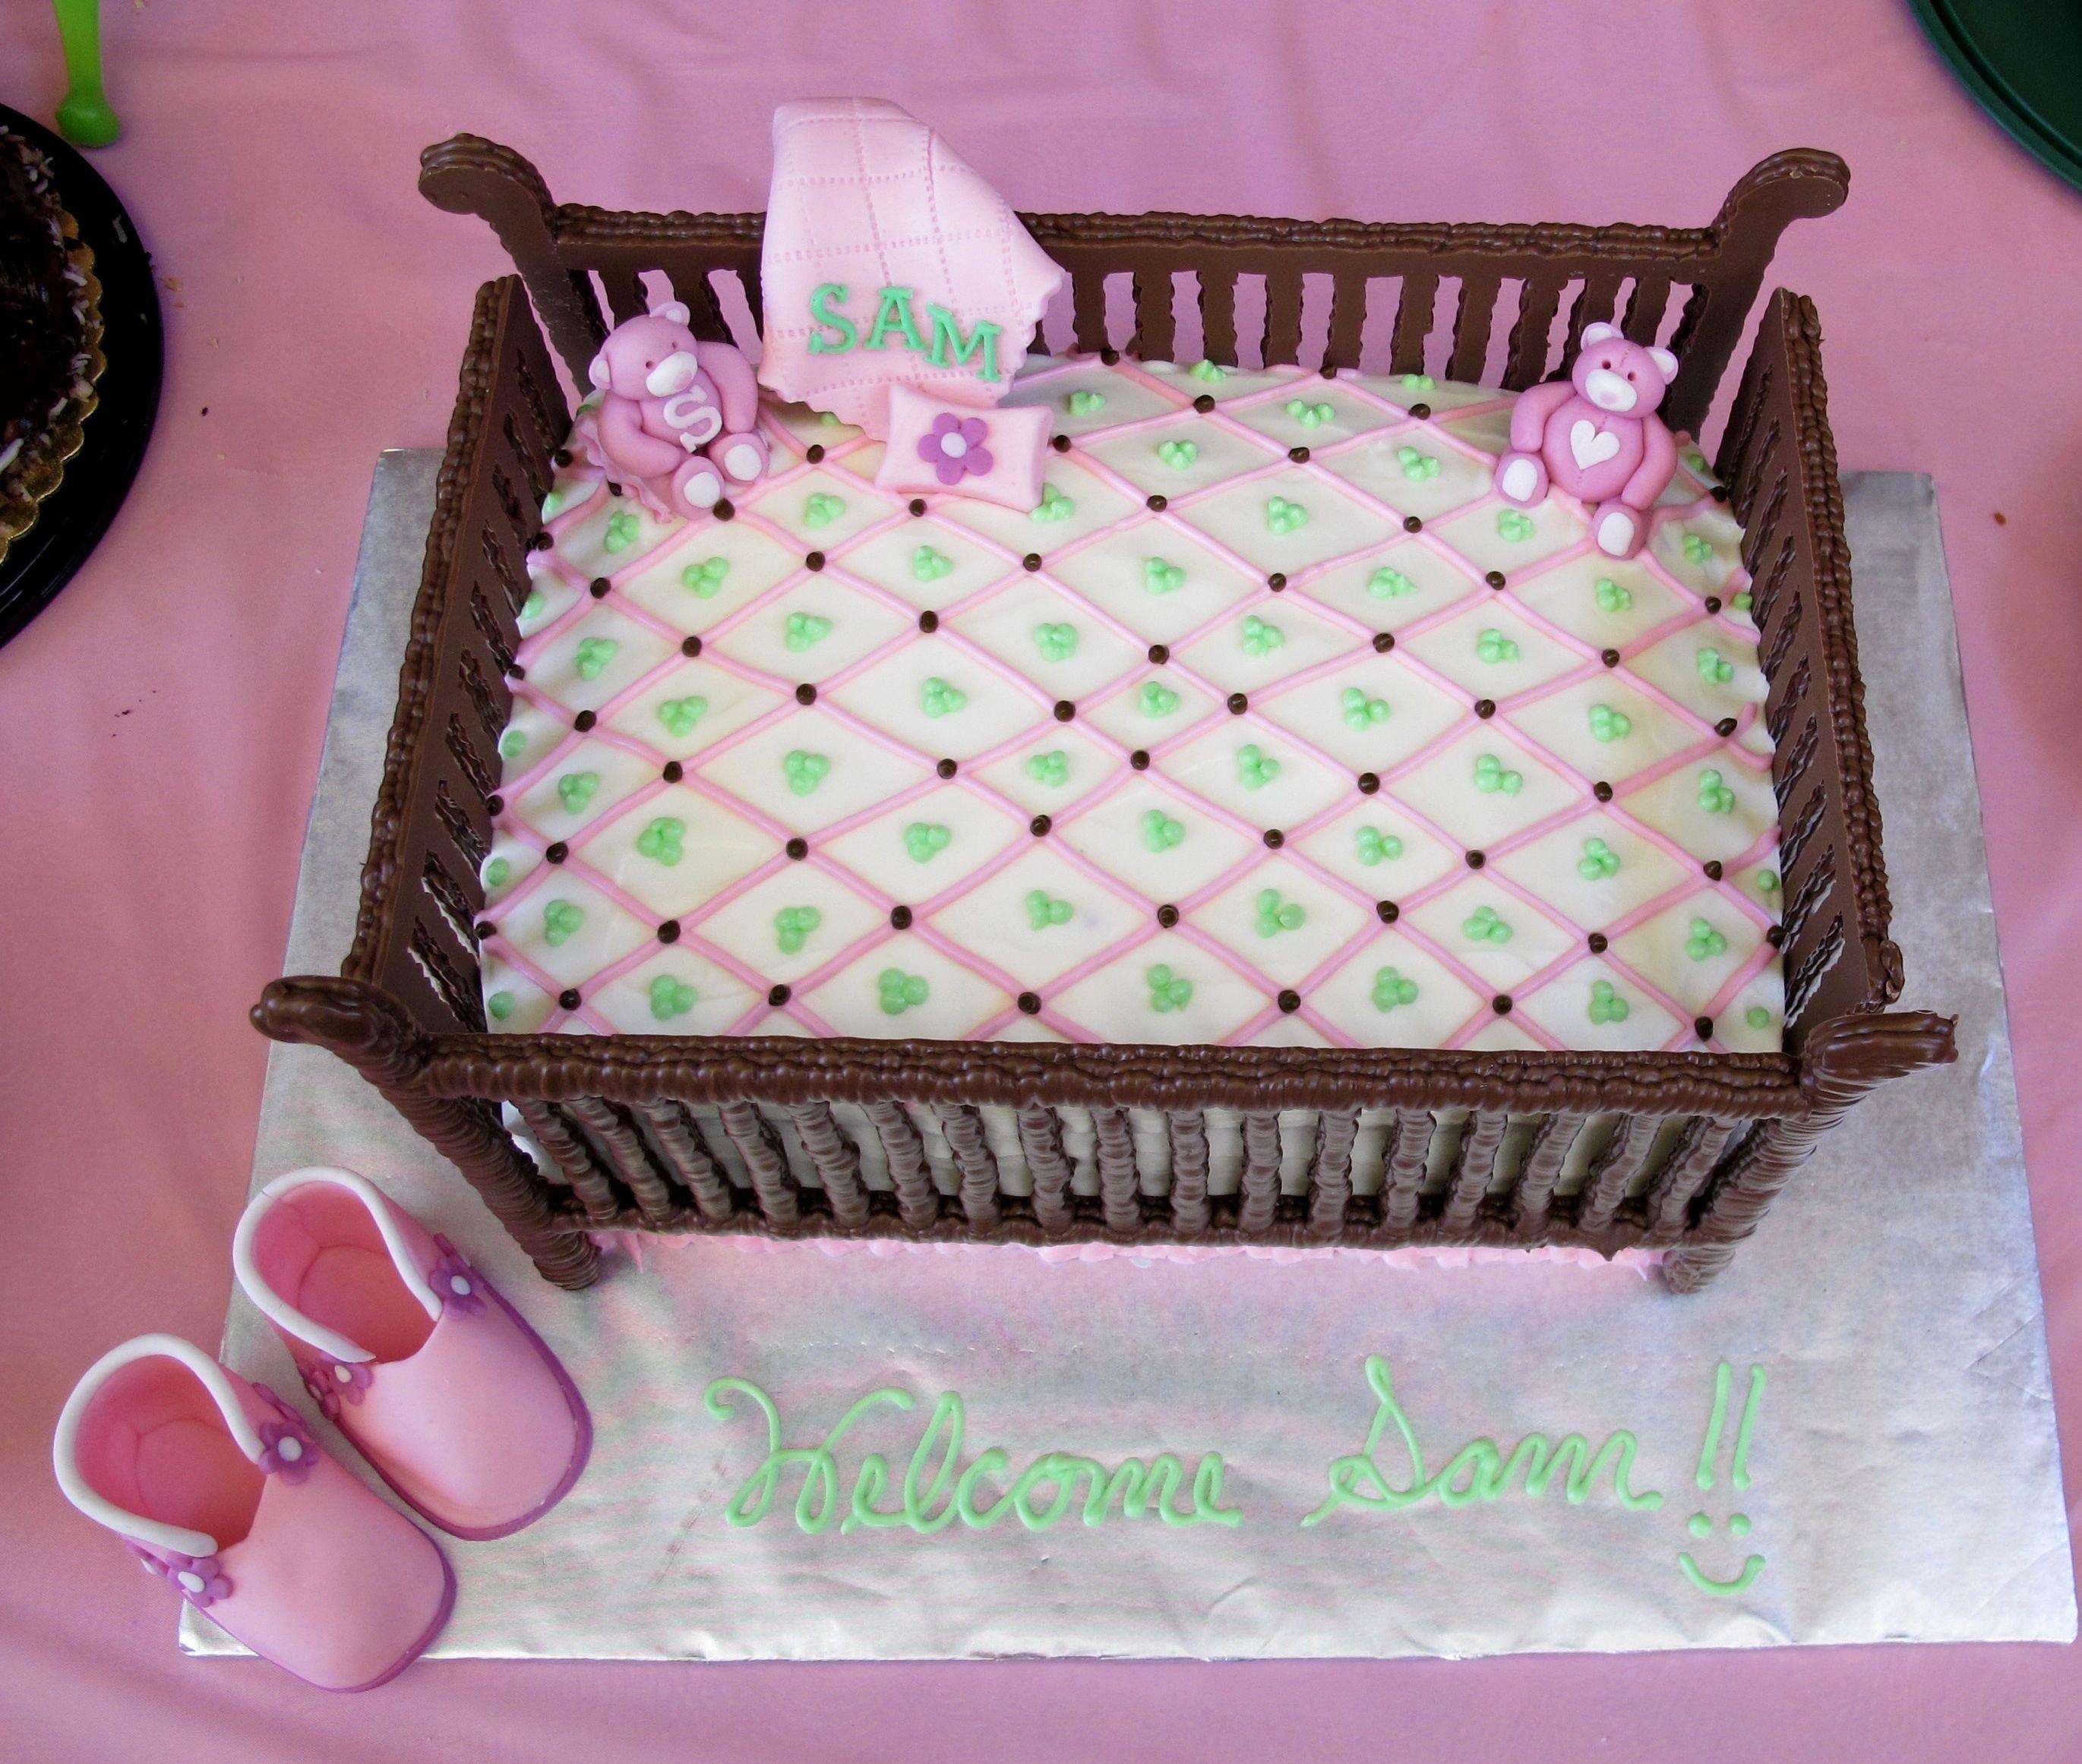 10 Nice Baby Shower Sheet Cake Ideas astounding design baby shower sheet cakes for girl cake ideas a 2021